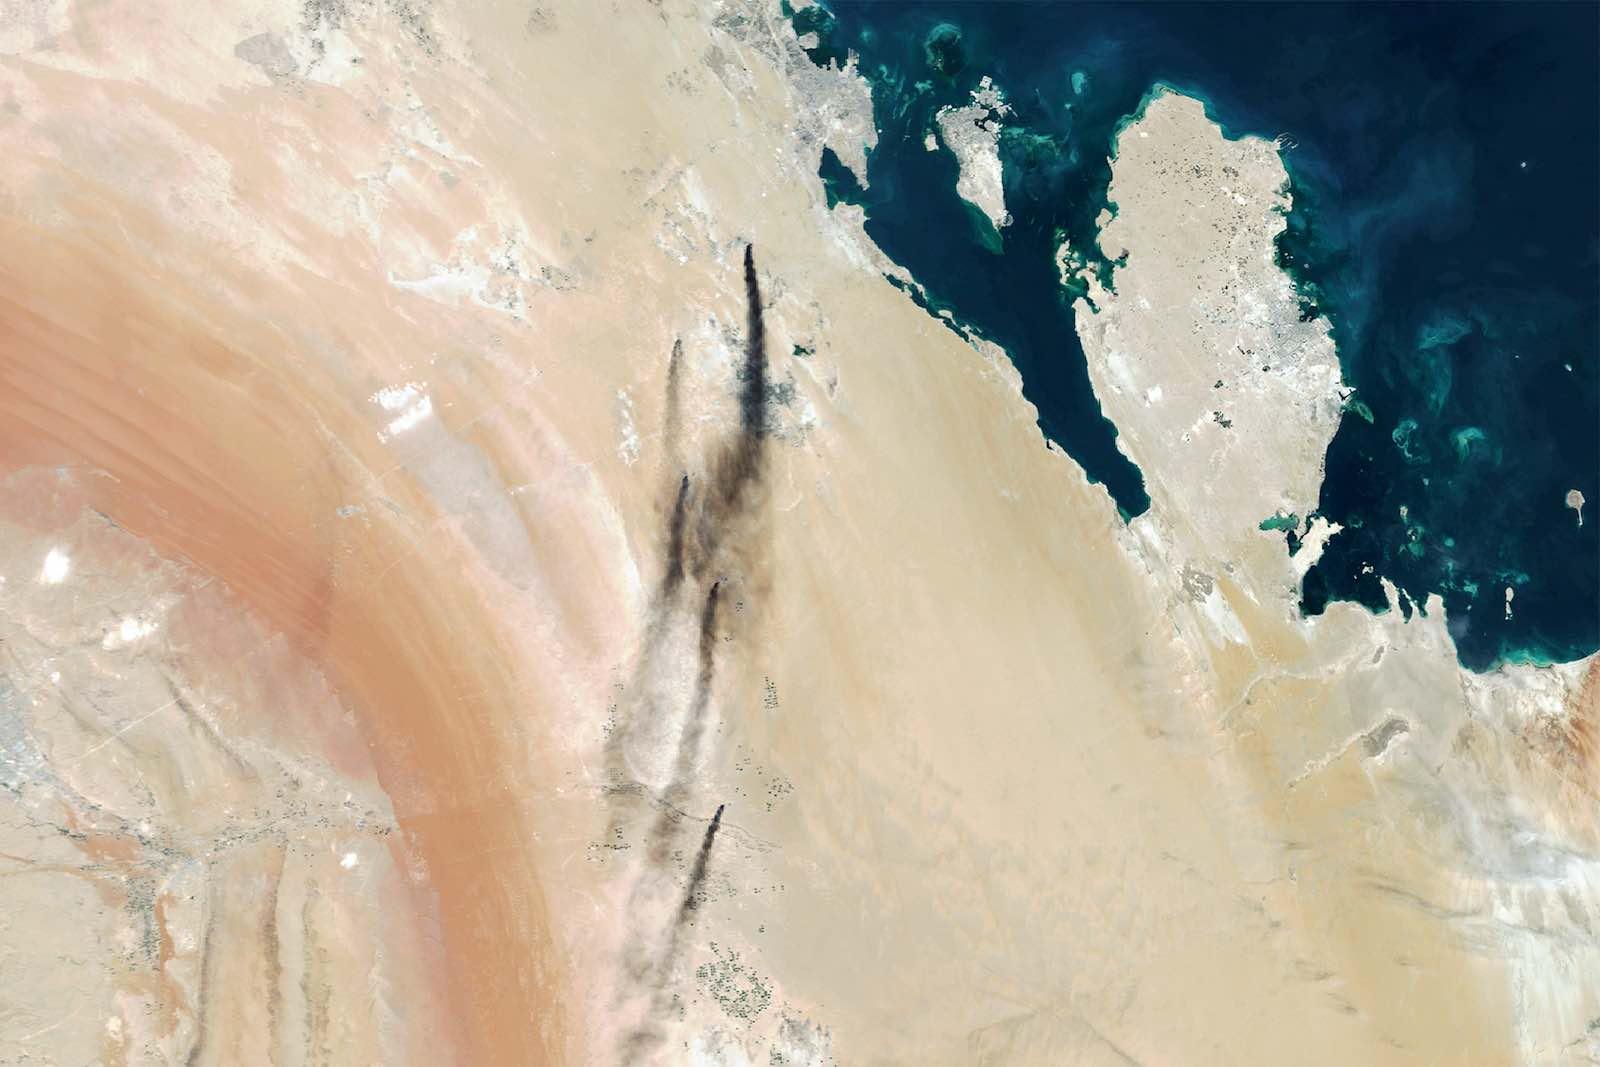 Smoke billows from Saudi Aramco's oil processing plants in Abqaiq and Khurais, Saudi Arabia. (Photo by Orbital Horizon via Getty Images)